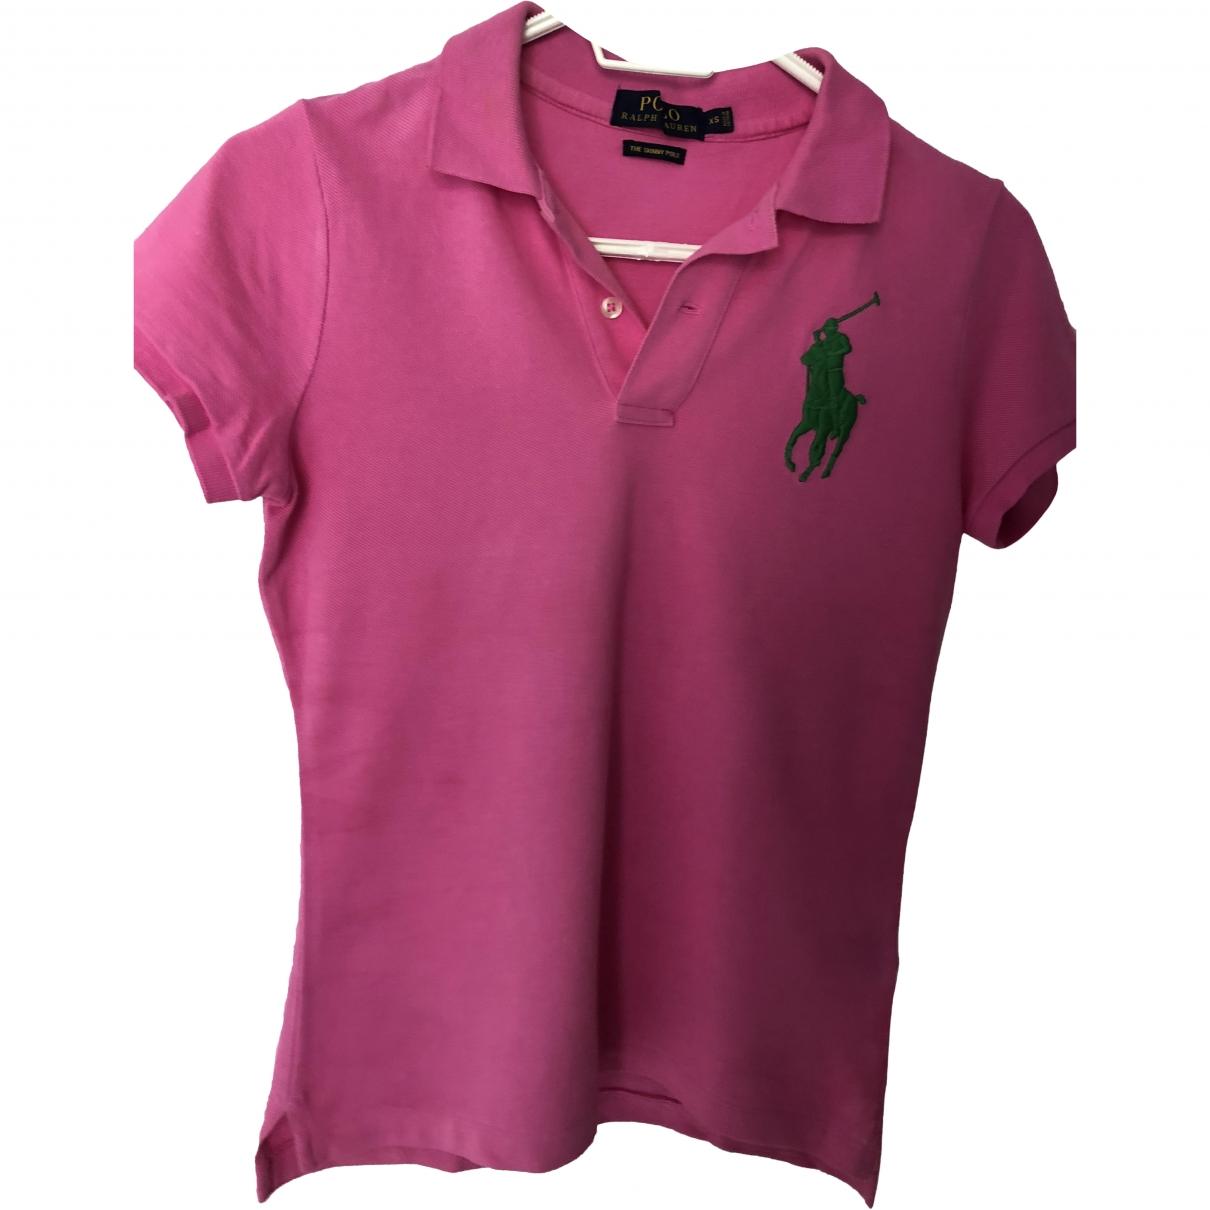 Polo Ralph Lauren \N Pink Cotton  top for Women S International